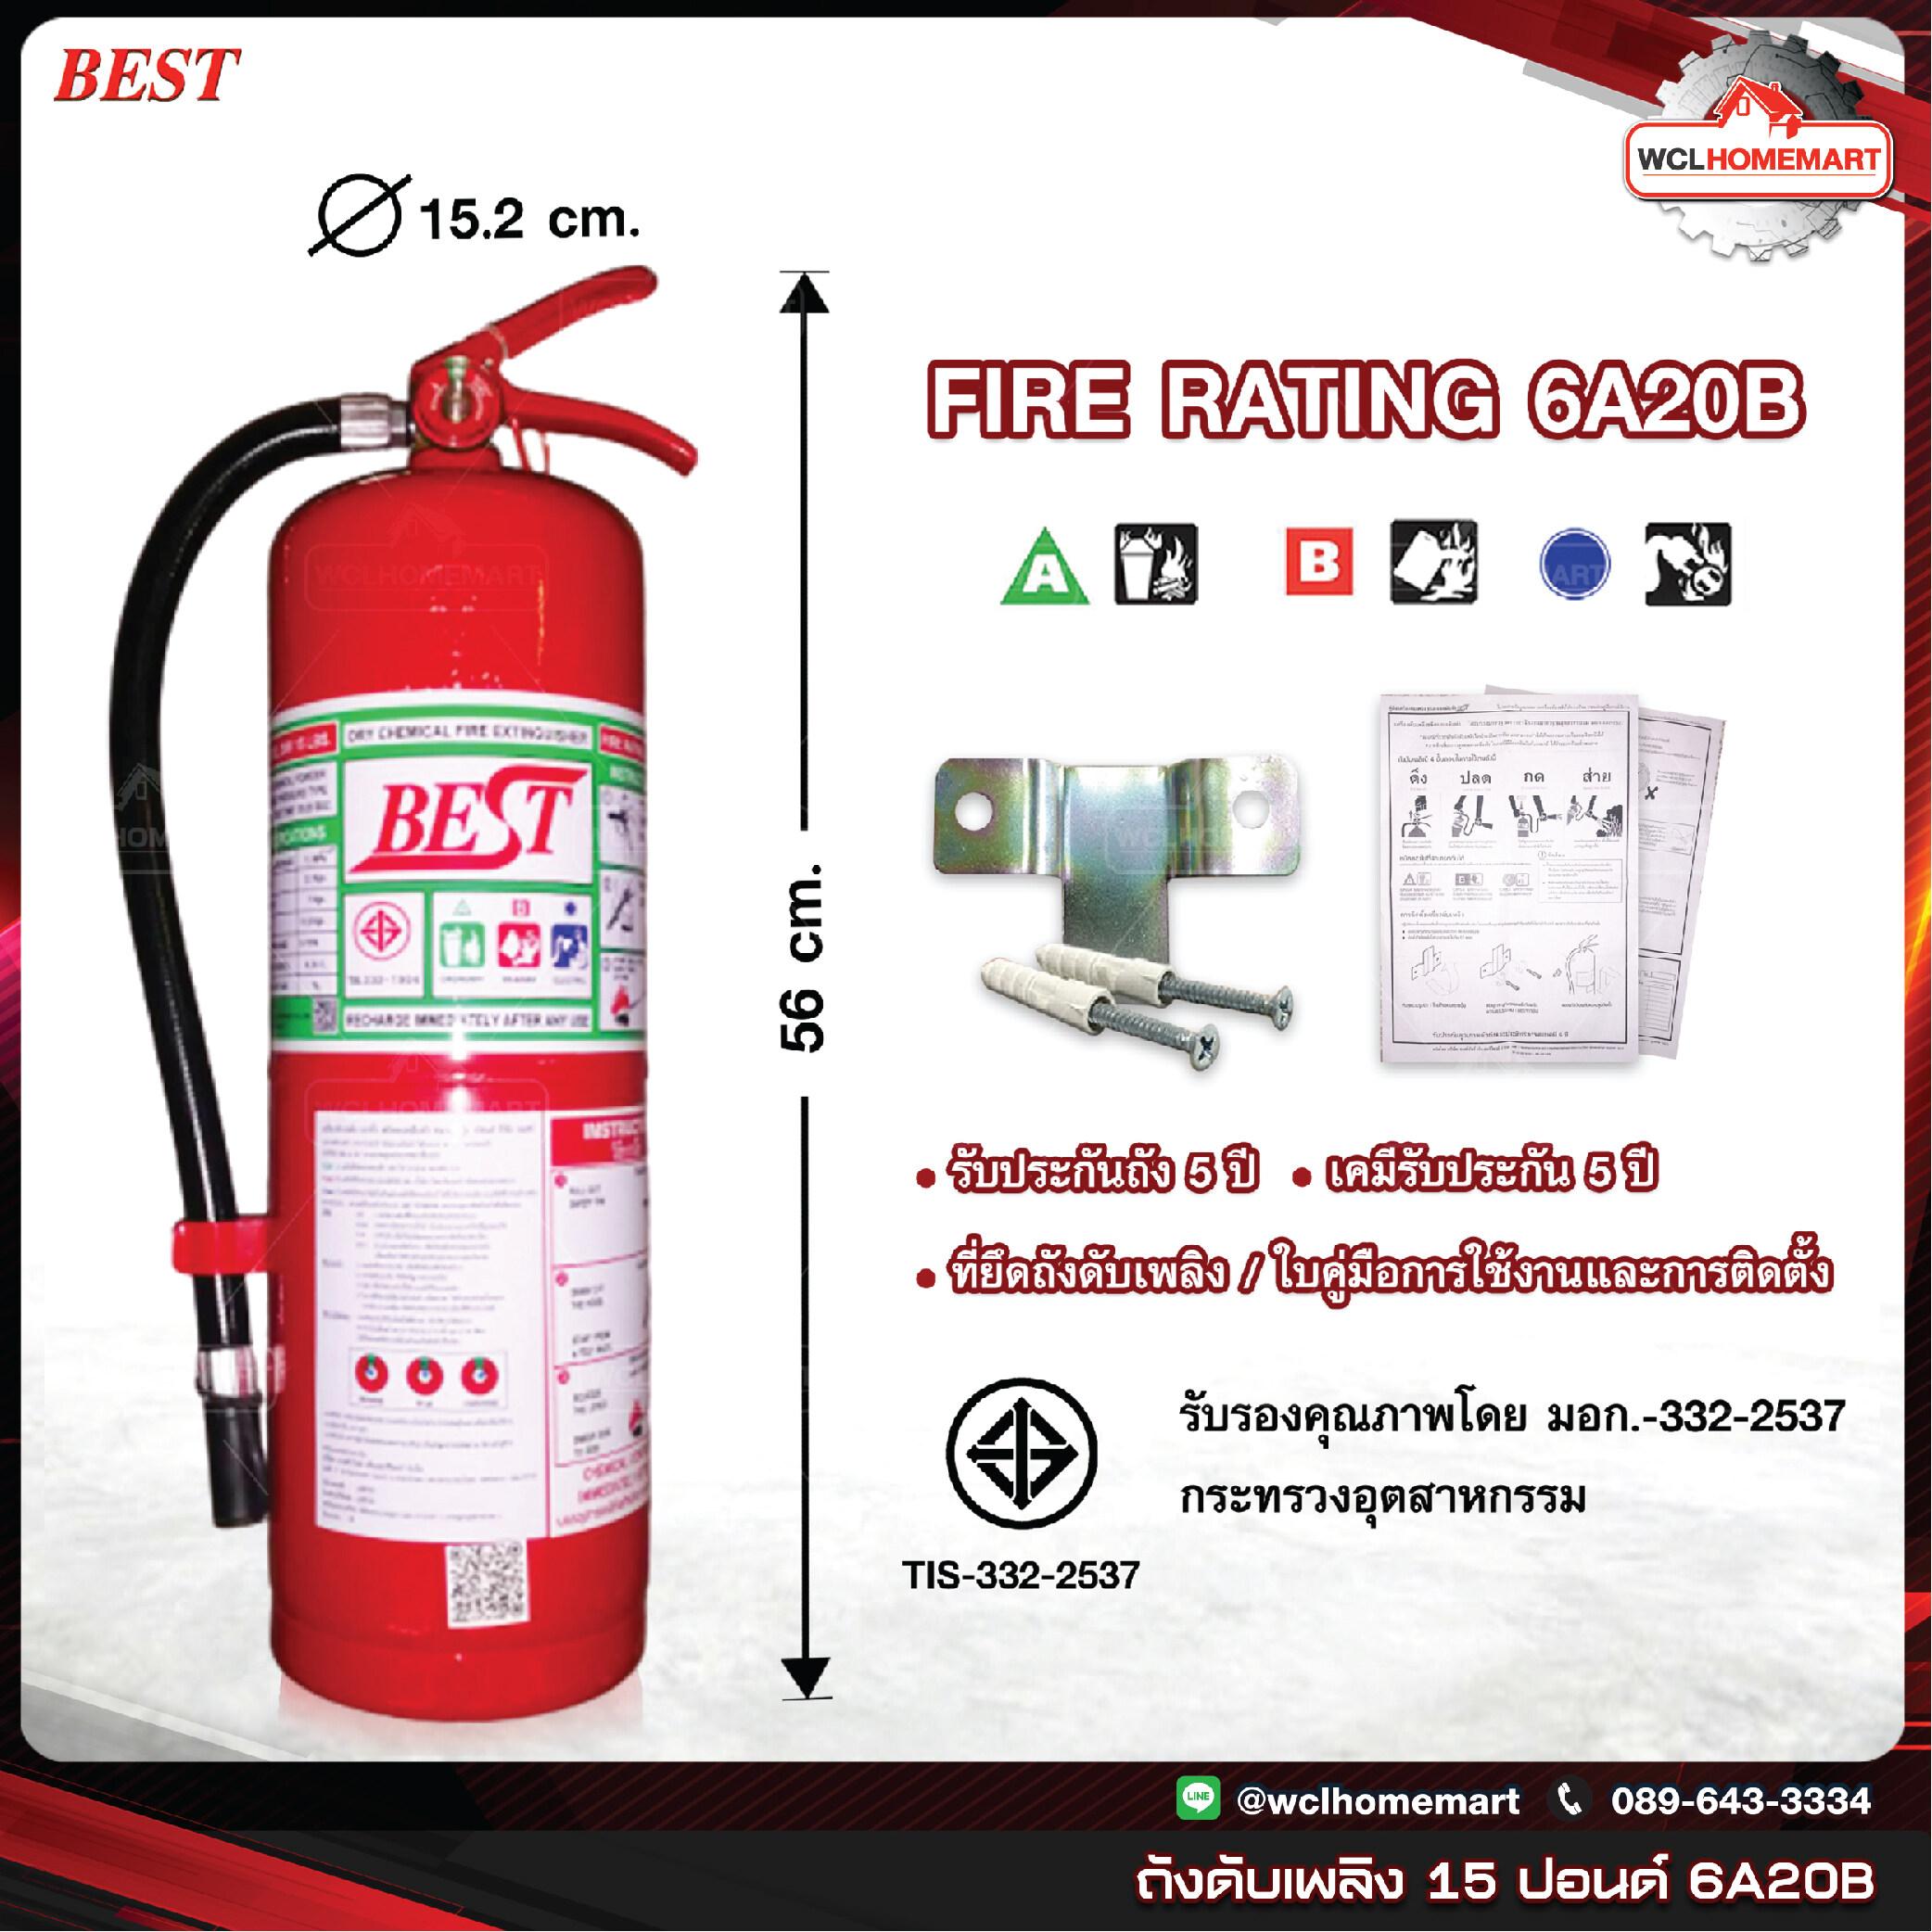 Best ถัง ดับเพลิง 15 ปอนด์ 6A20B Dry Chemical Fire Extinguisher – Red เครื่องดับเพลิง